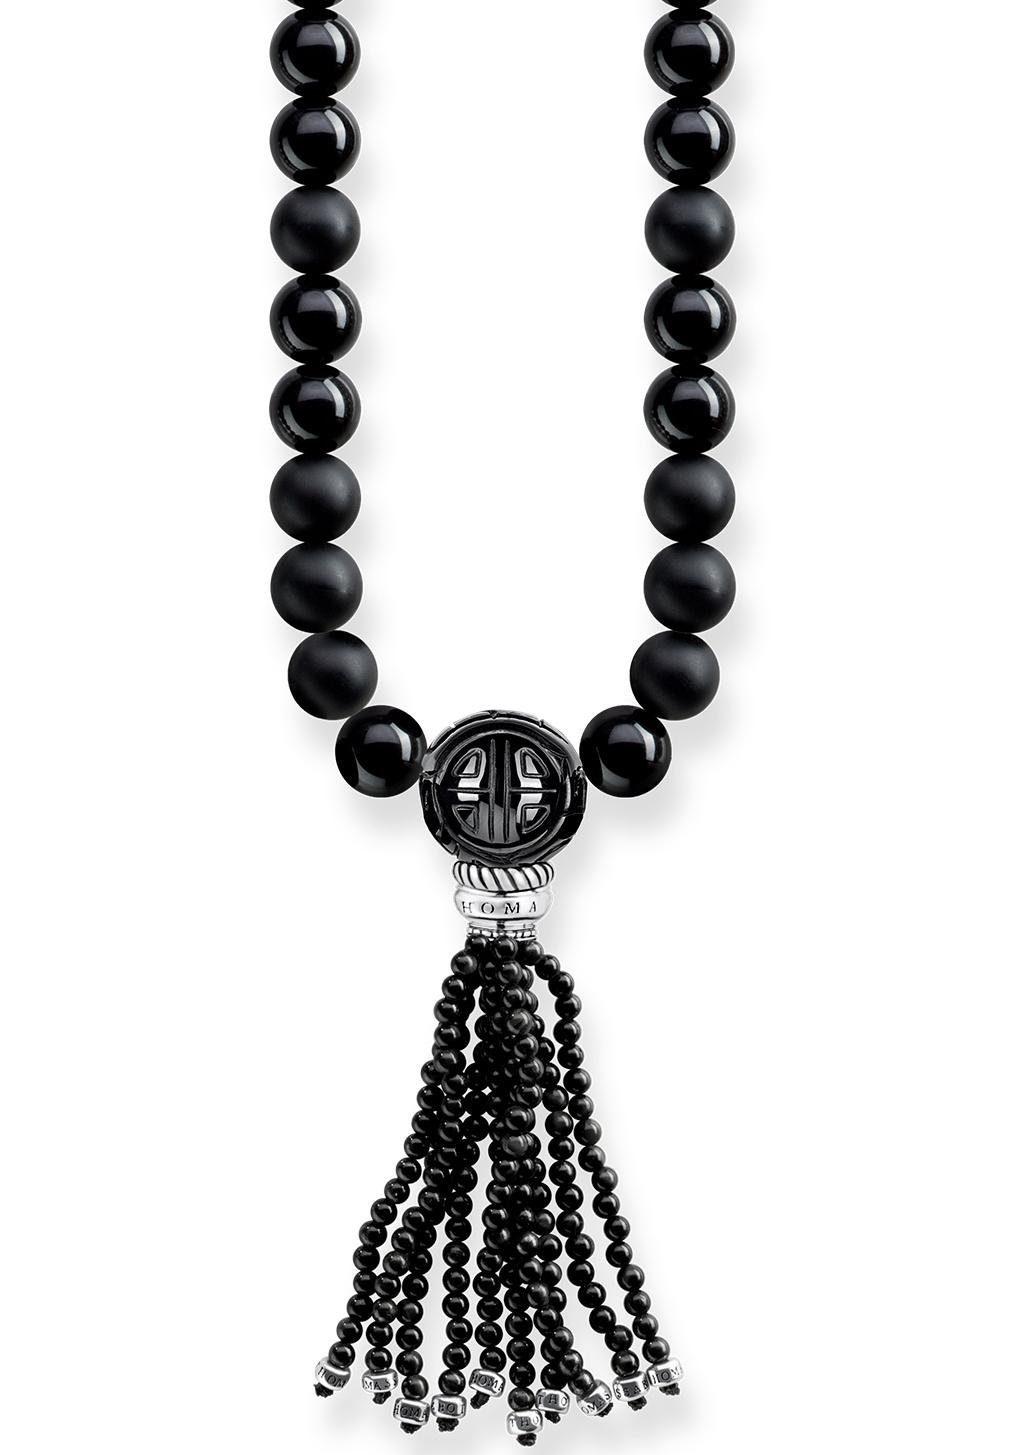 THOMAS SABO Kette mit Anhänger »Power Necklace Schwarz, KE1676-704-11-L90« mit Obsidian